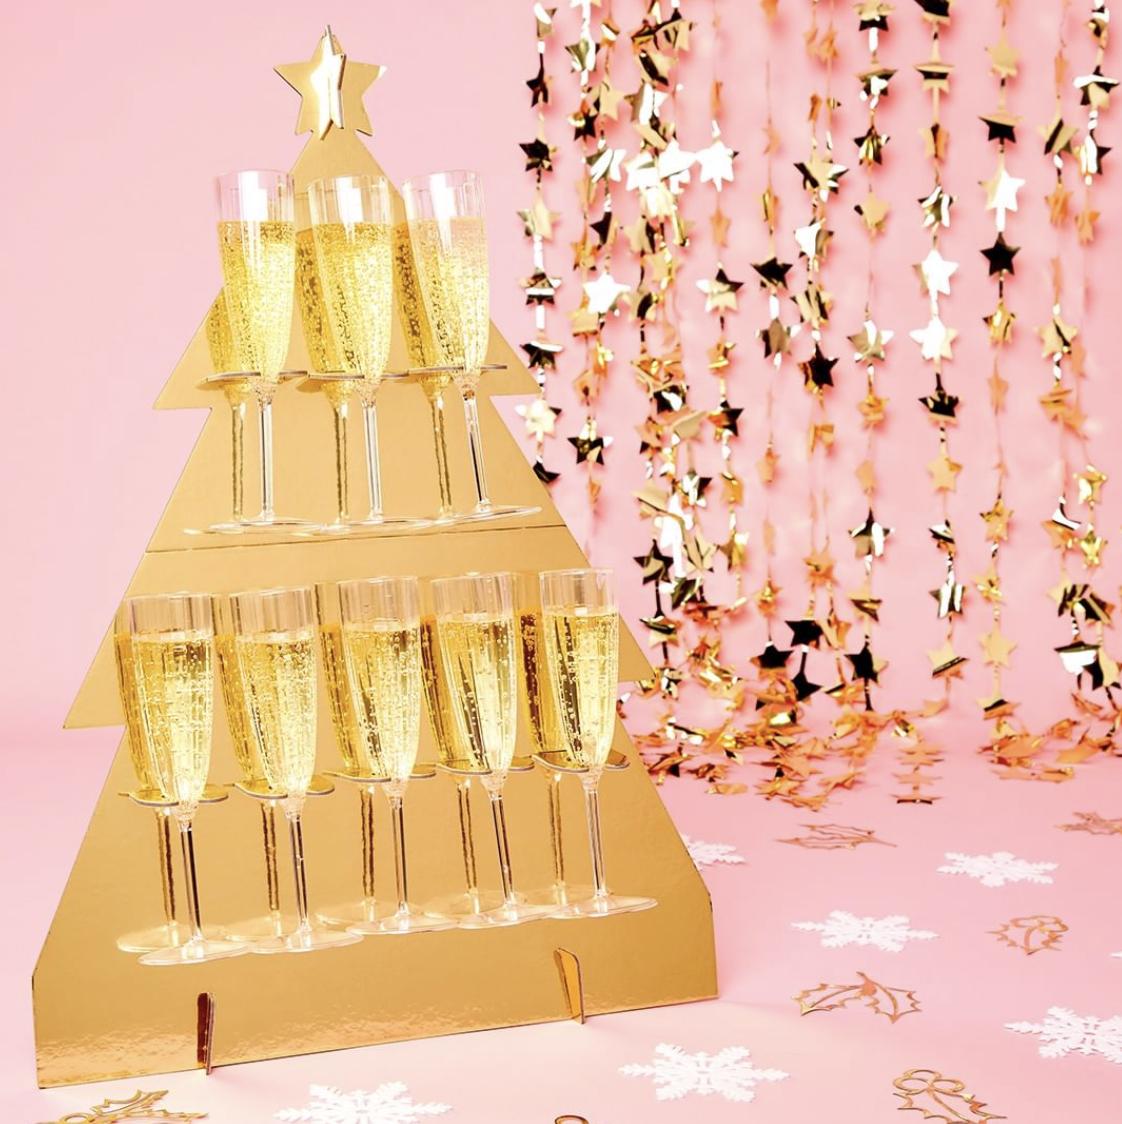 kerstboom champagne toren